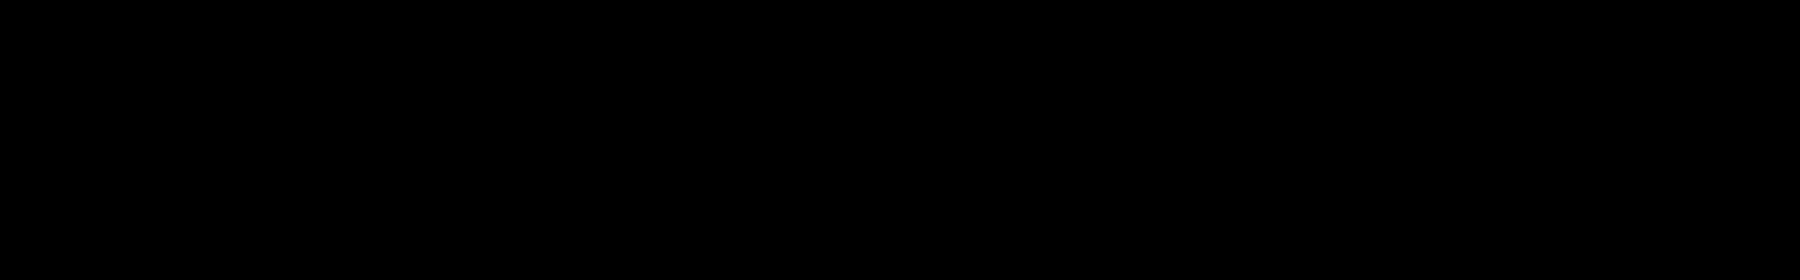 Feeldii EDM Midi Melodies audio waveform